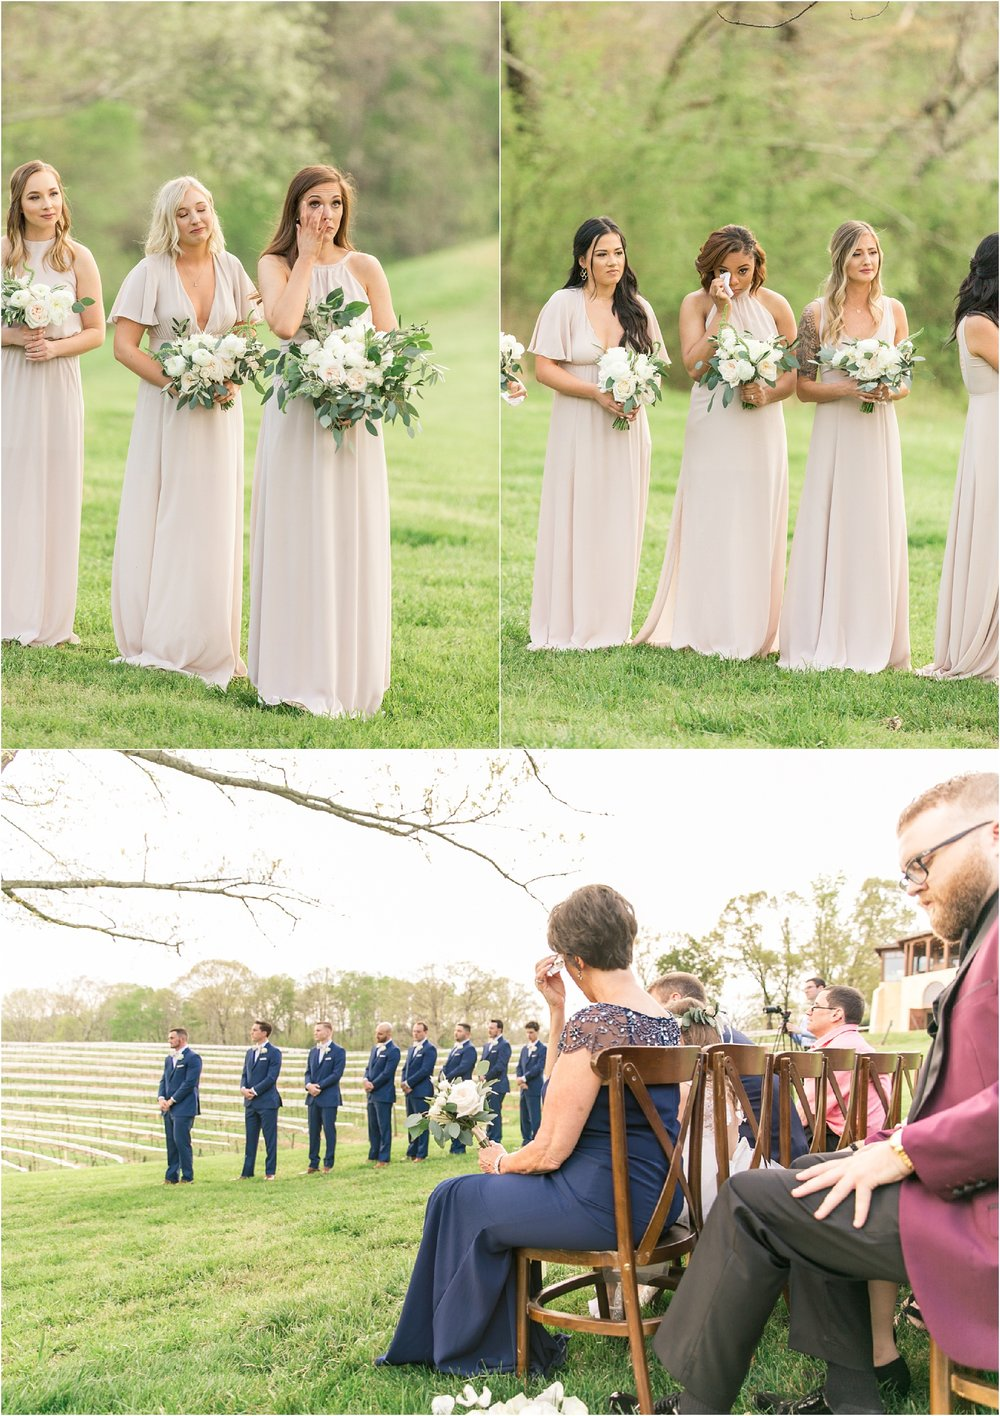 Savannah Eve Photography- Turnbill-Gilgan Wedding- Blog-47.jpg